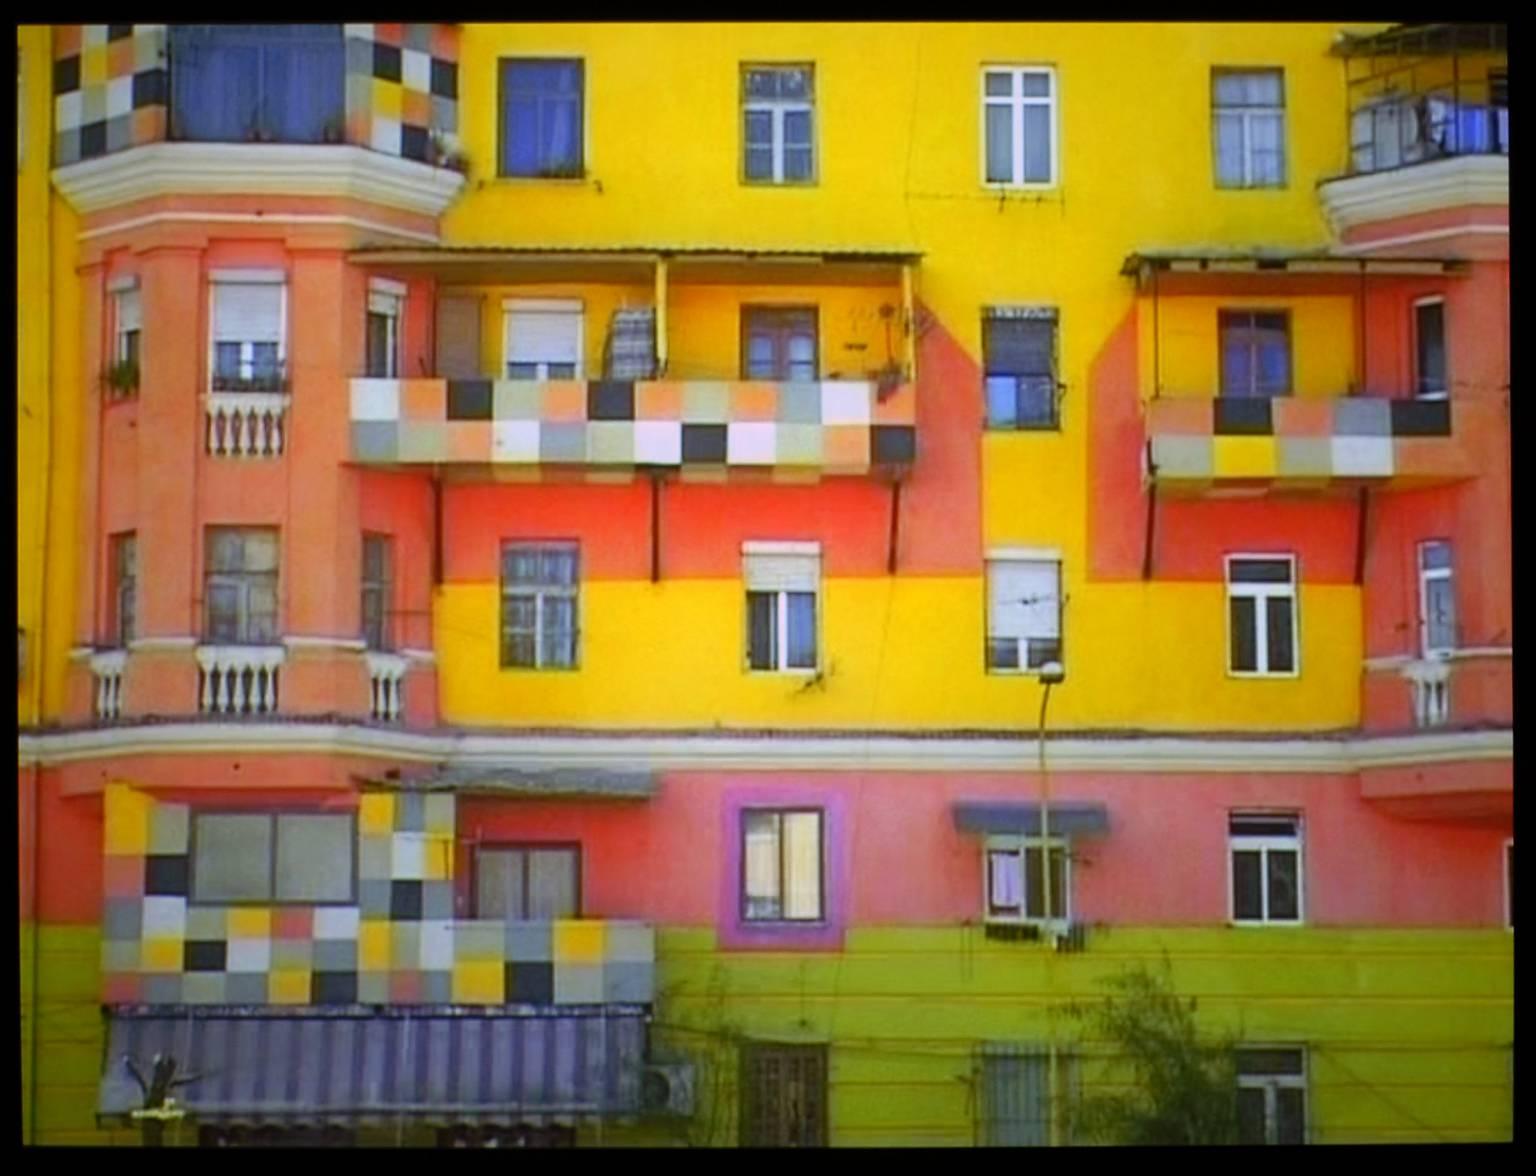 Dammi i Colori, Anri Sala, 2003